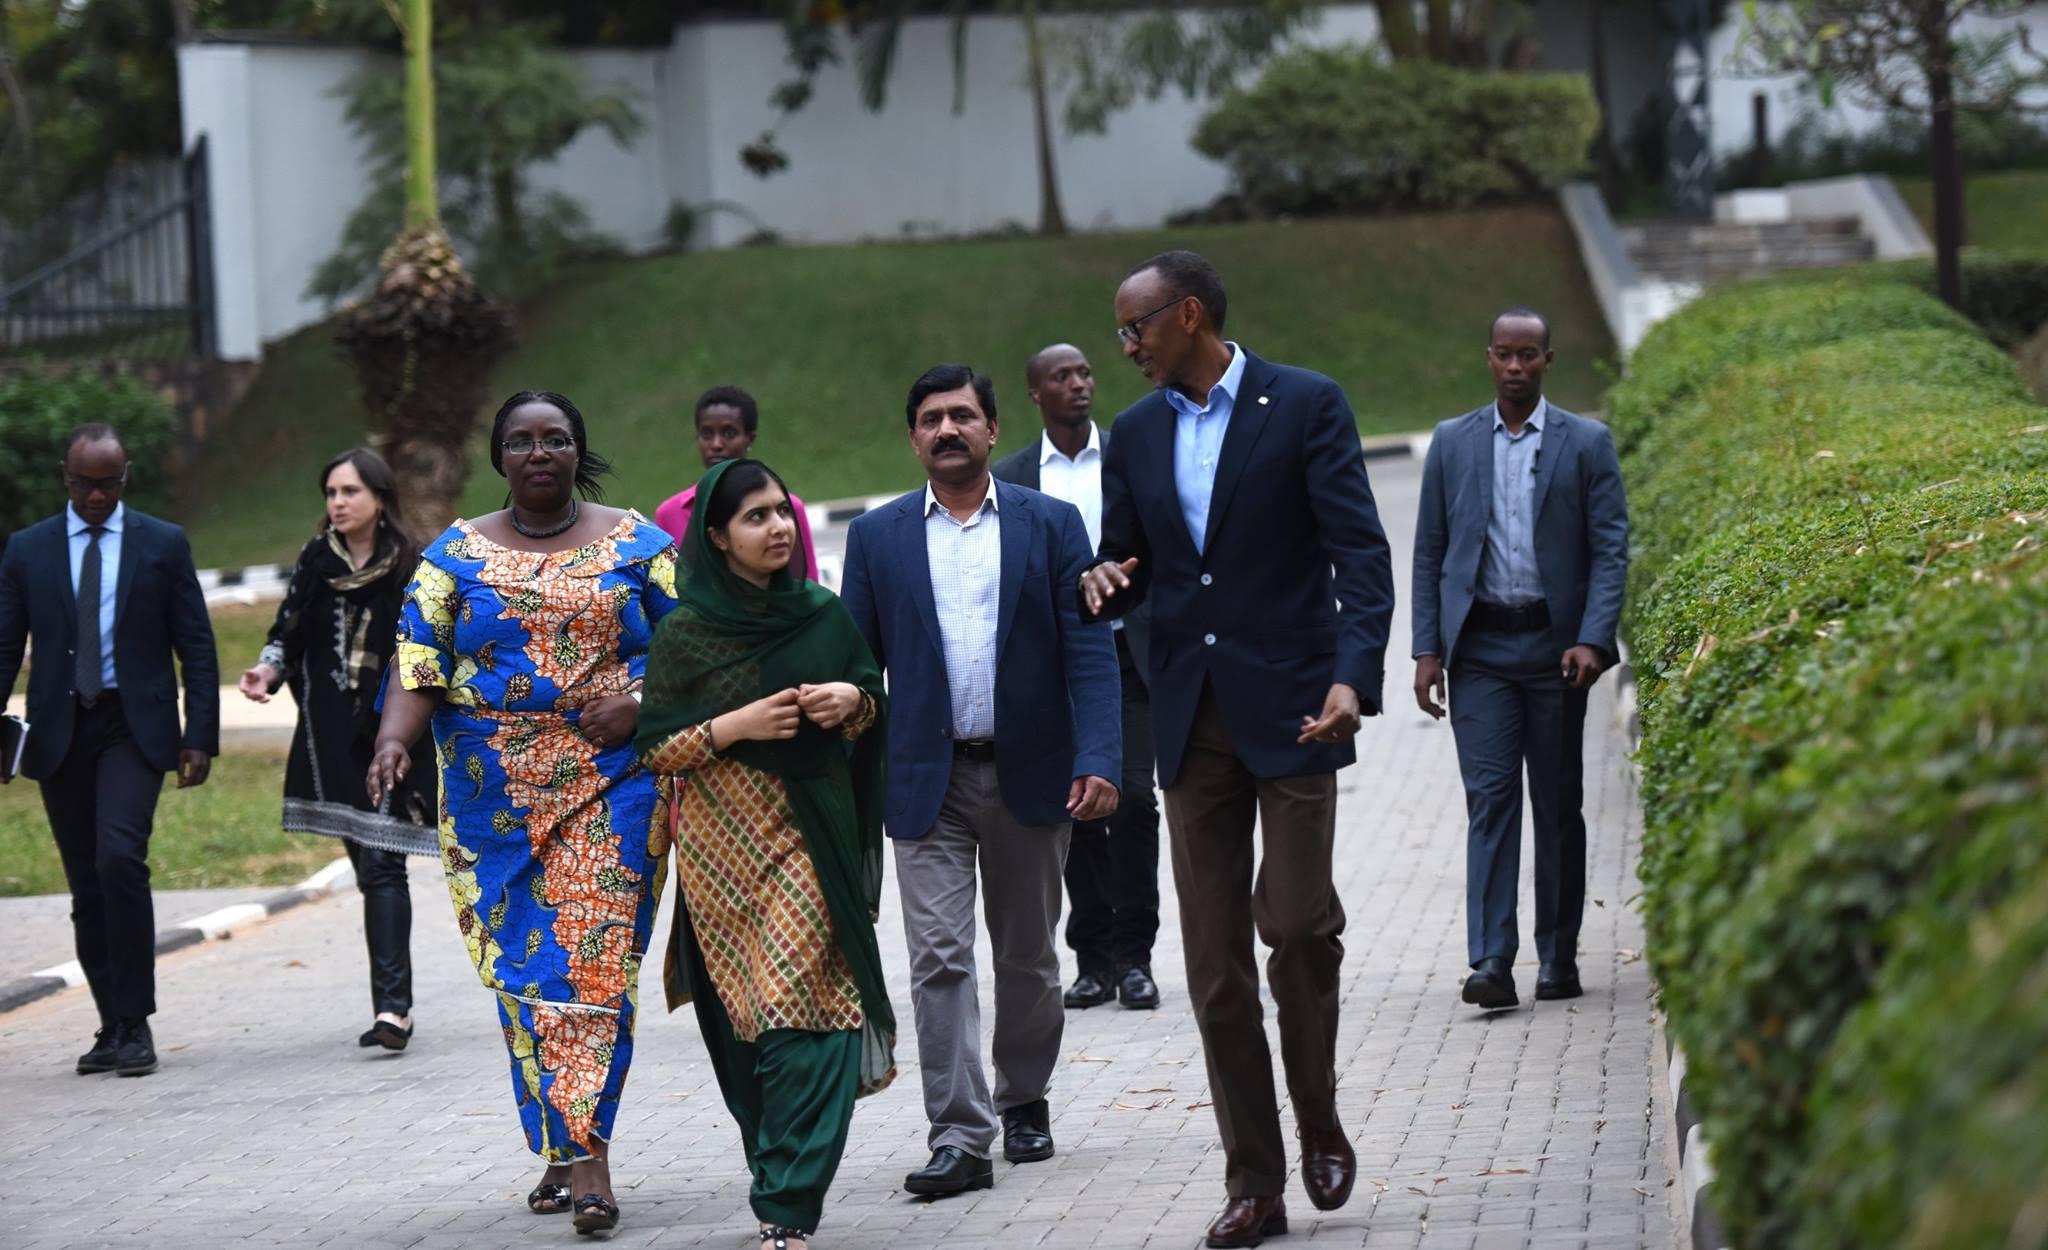 President Paul Kagame chats with Nobel laureate Malala Yousafzai after arriving in Rwanda